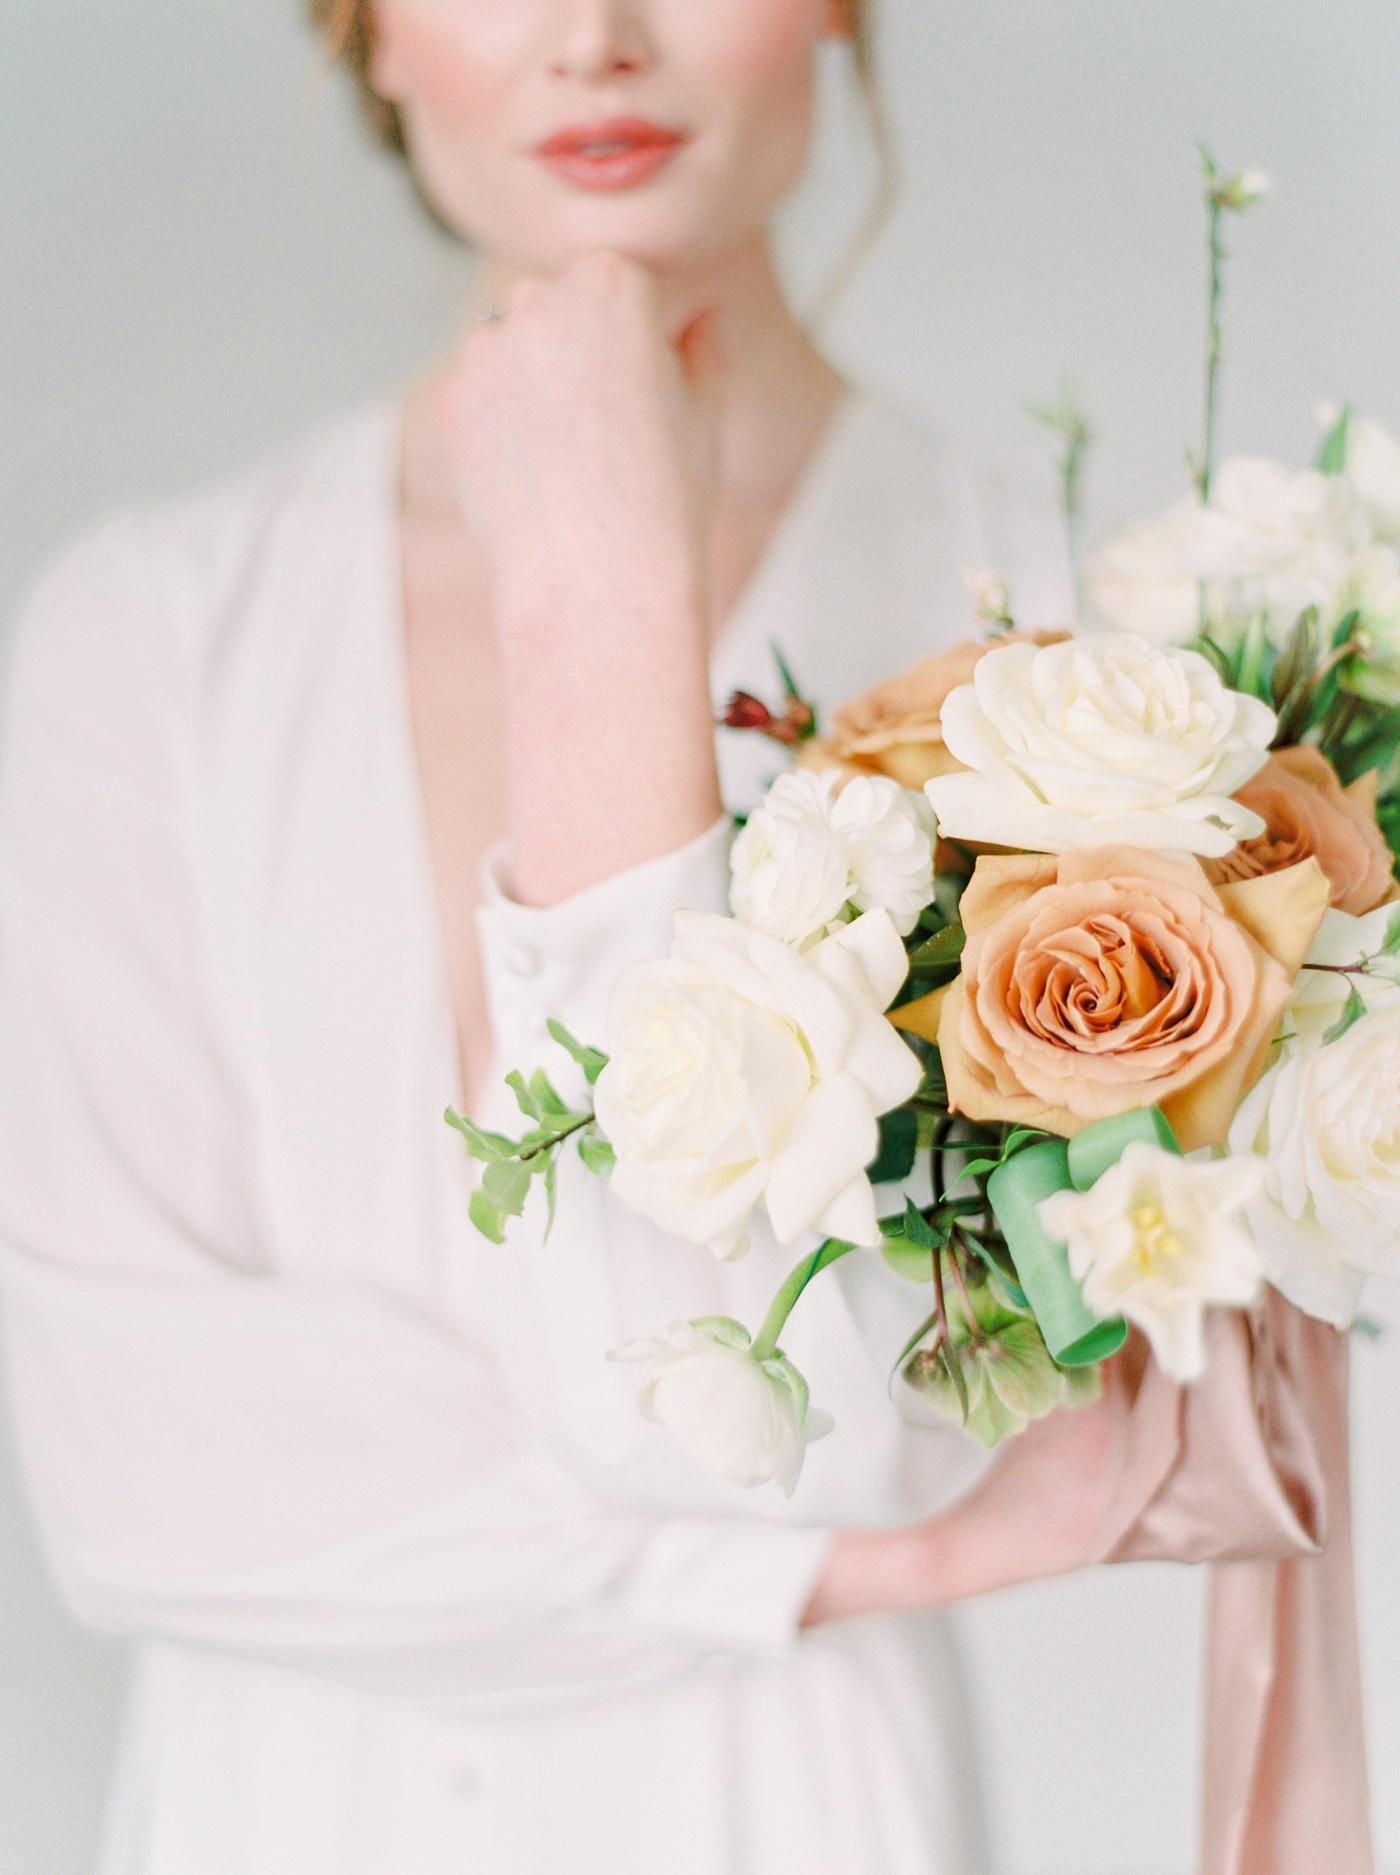 Calgary wedding photographers | editorial minimalist inspired wedding shoot | stacey foley weddings joy wed blog | vancouver wedding photographer | Justine Milton Photography